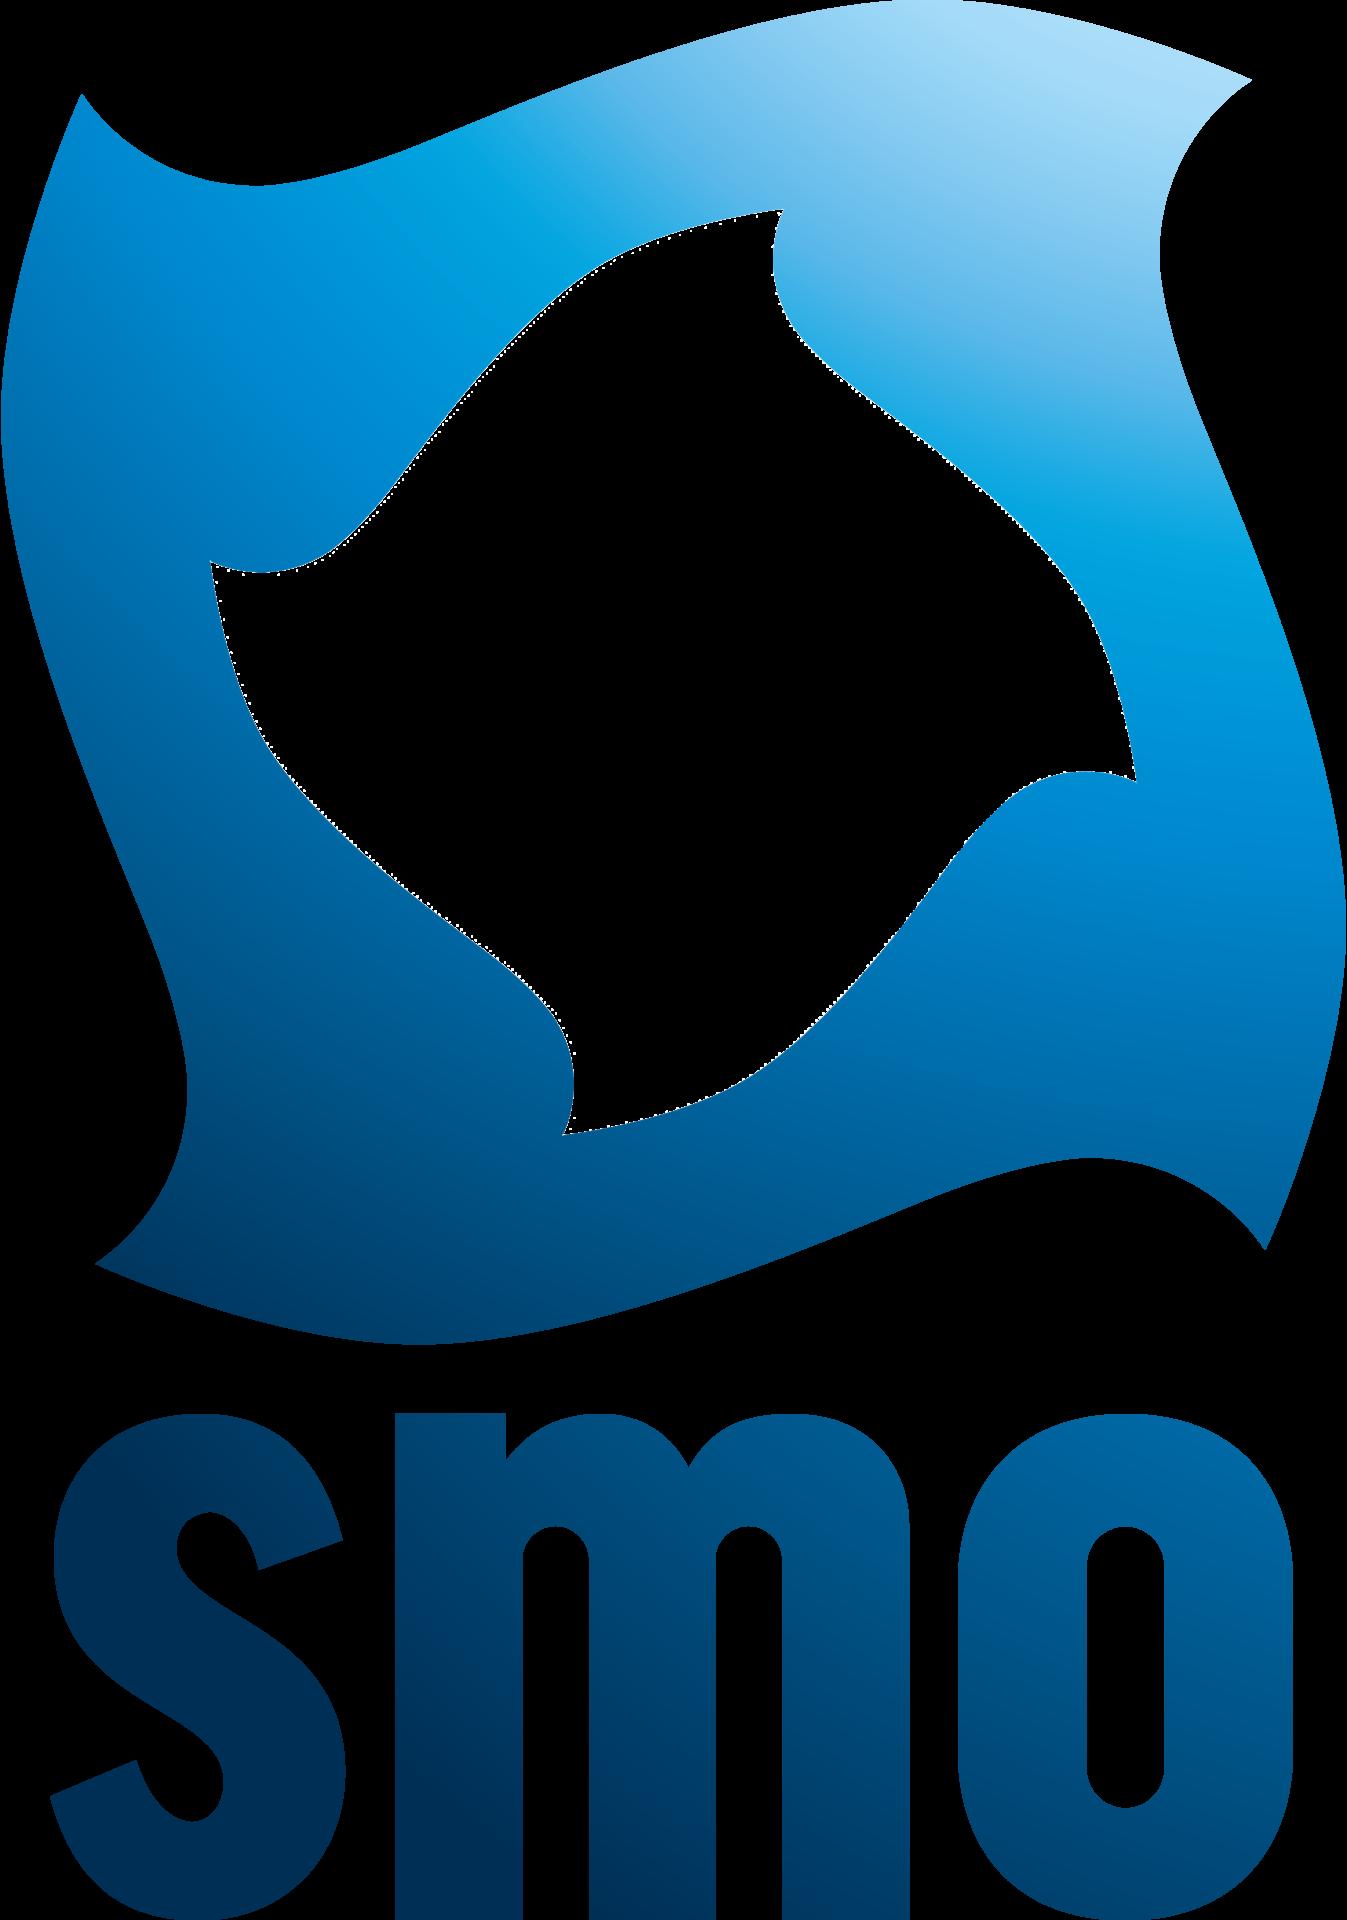 SMO-logo-png-7